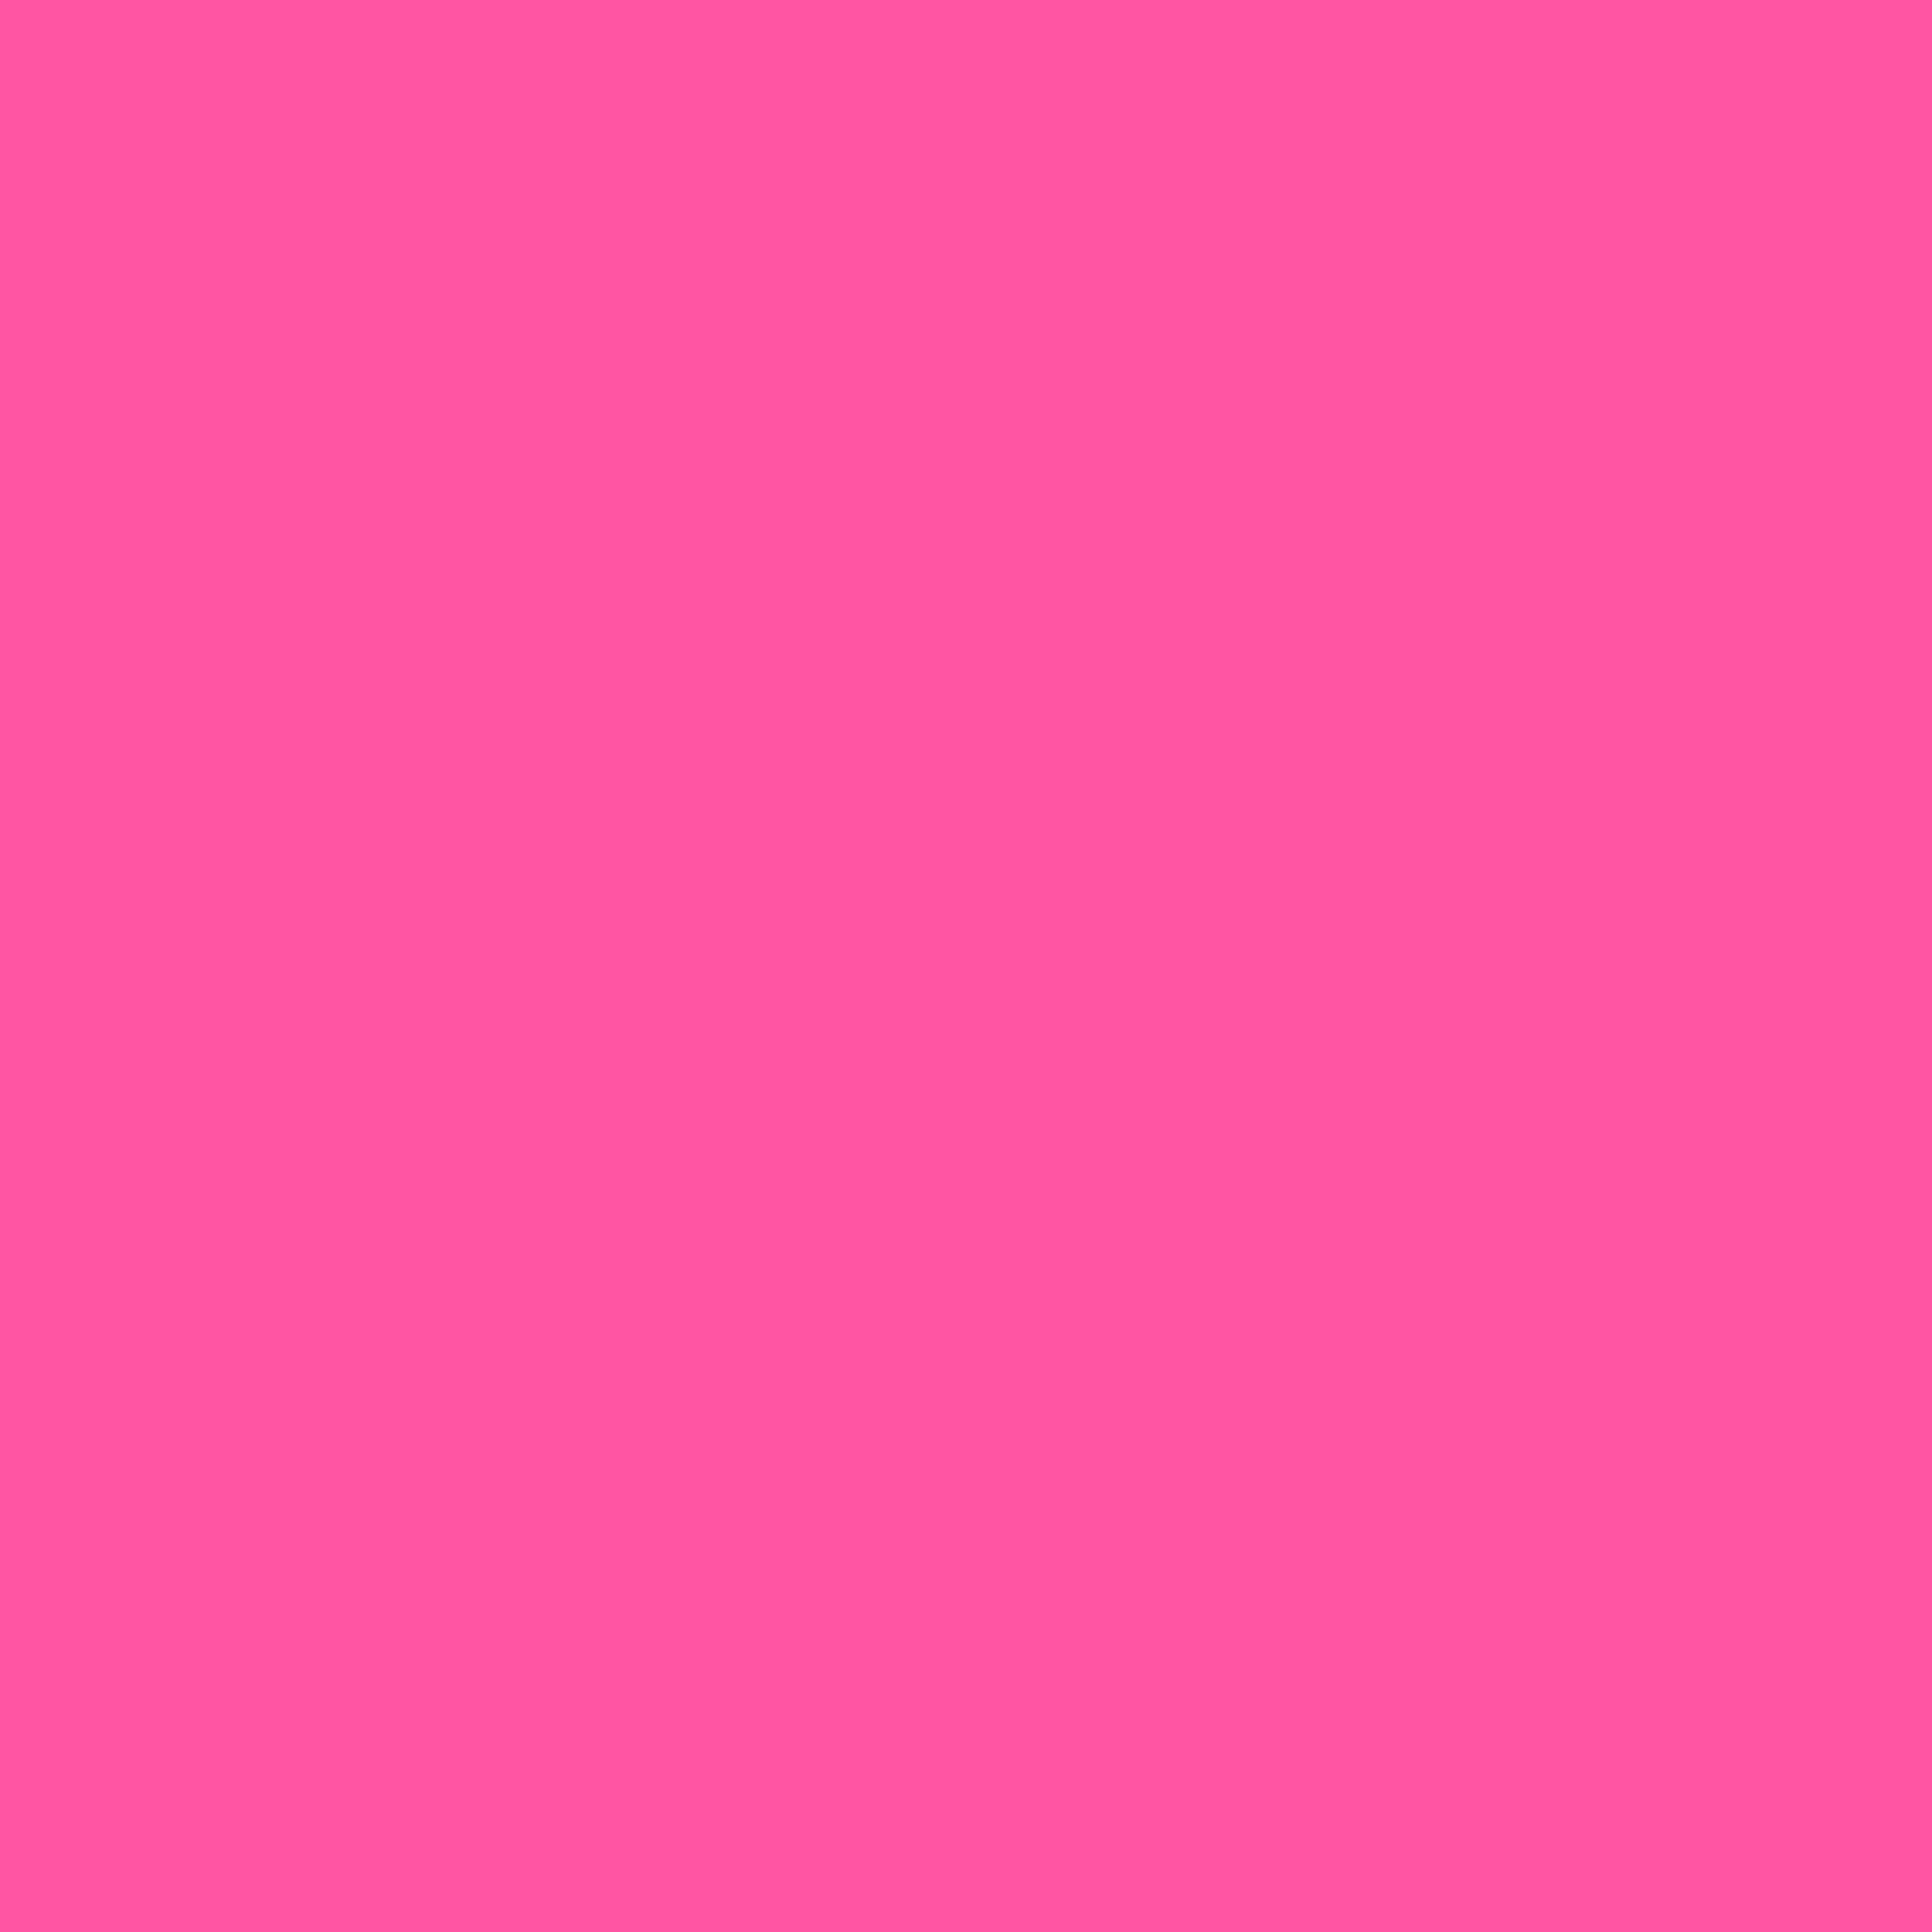 2048x2048 Brilliant Rose Solid Color Background